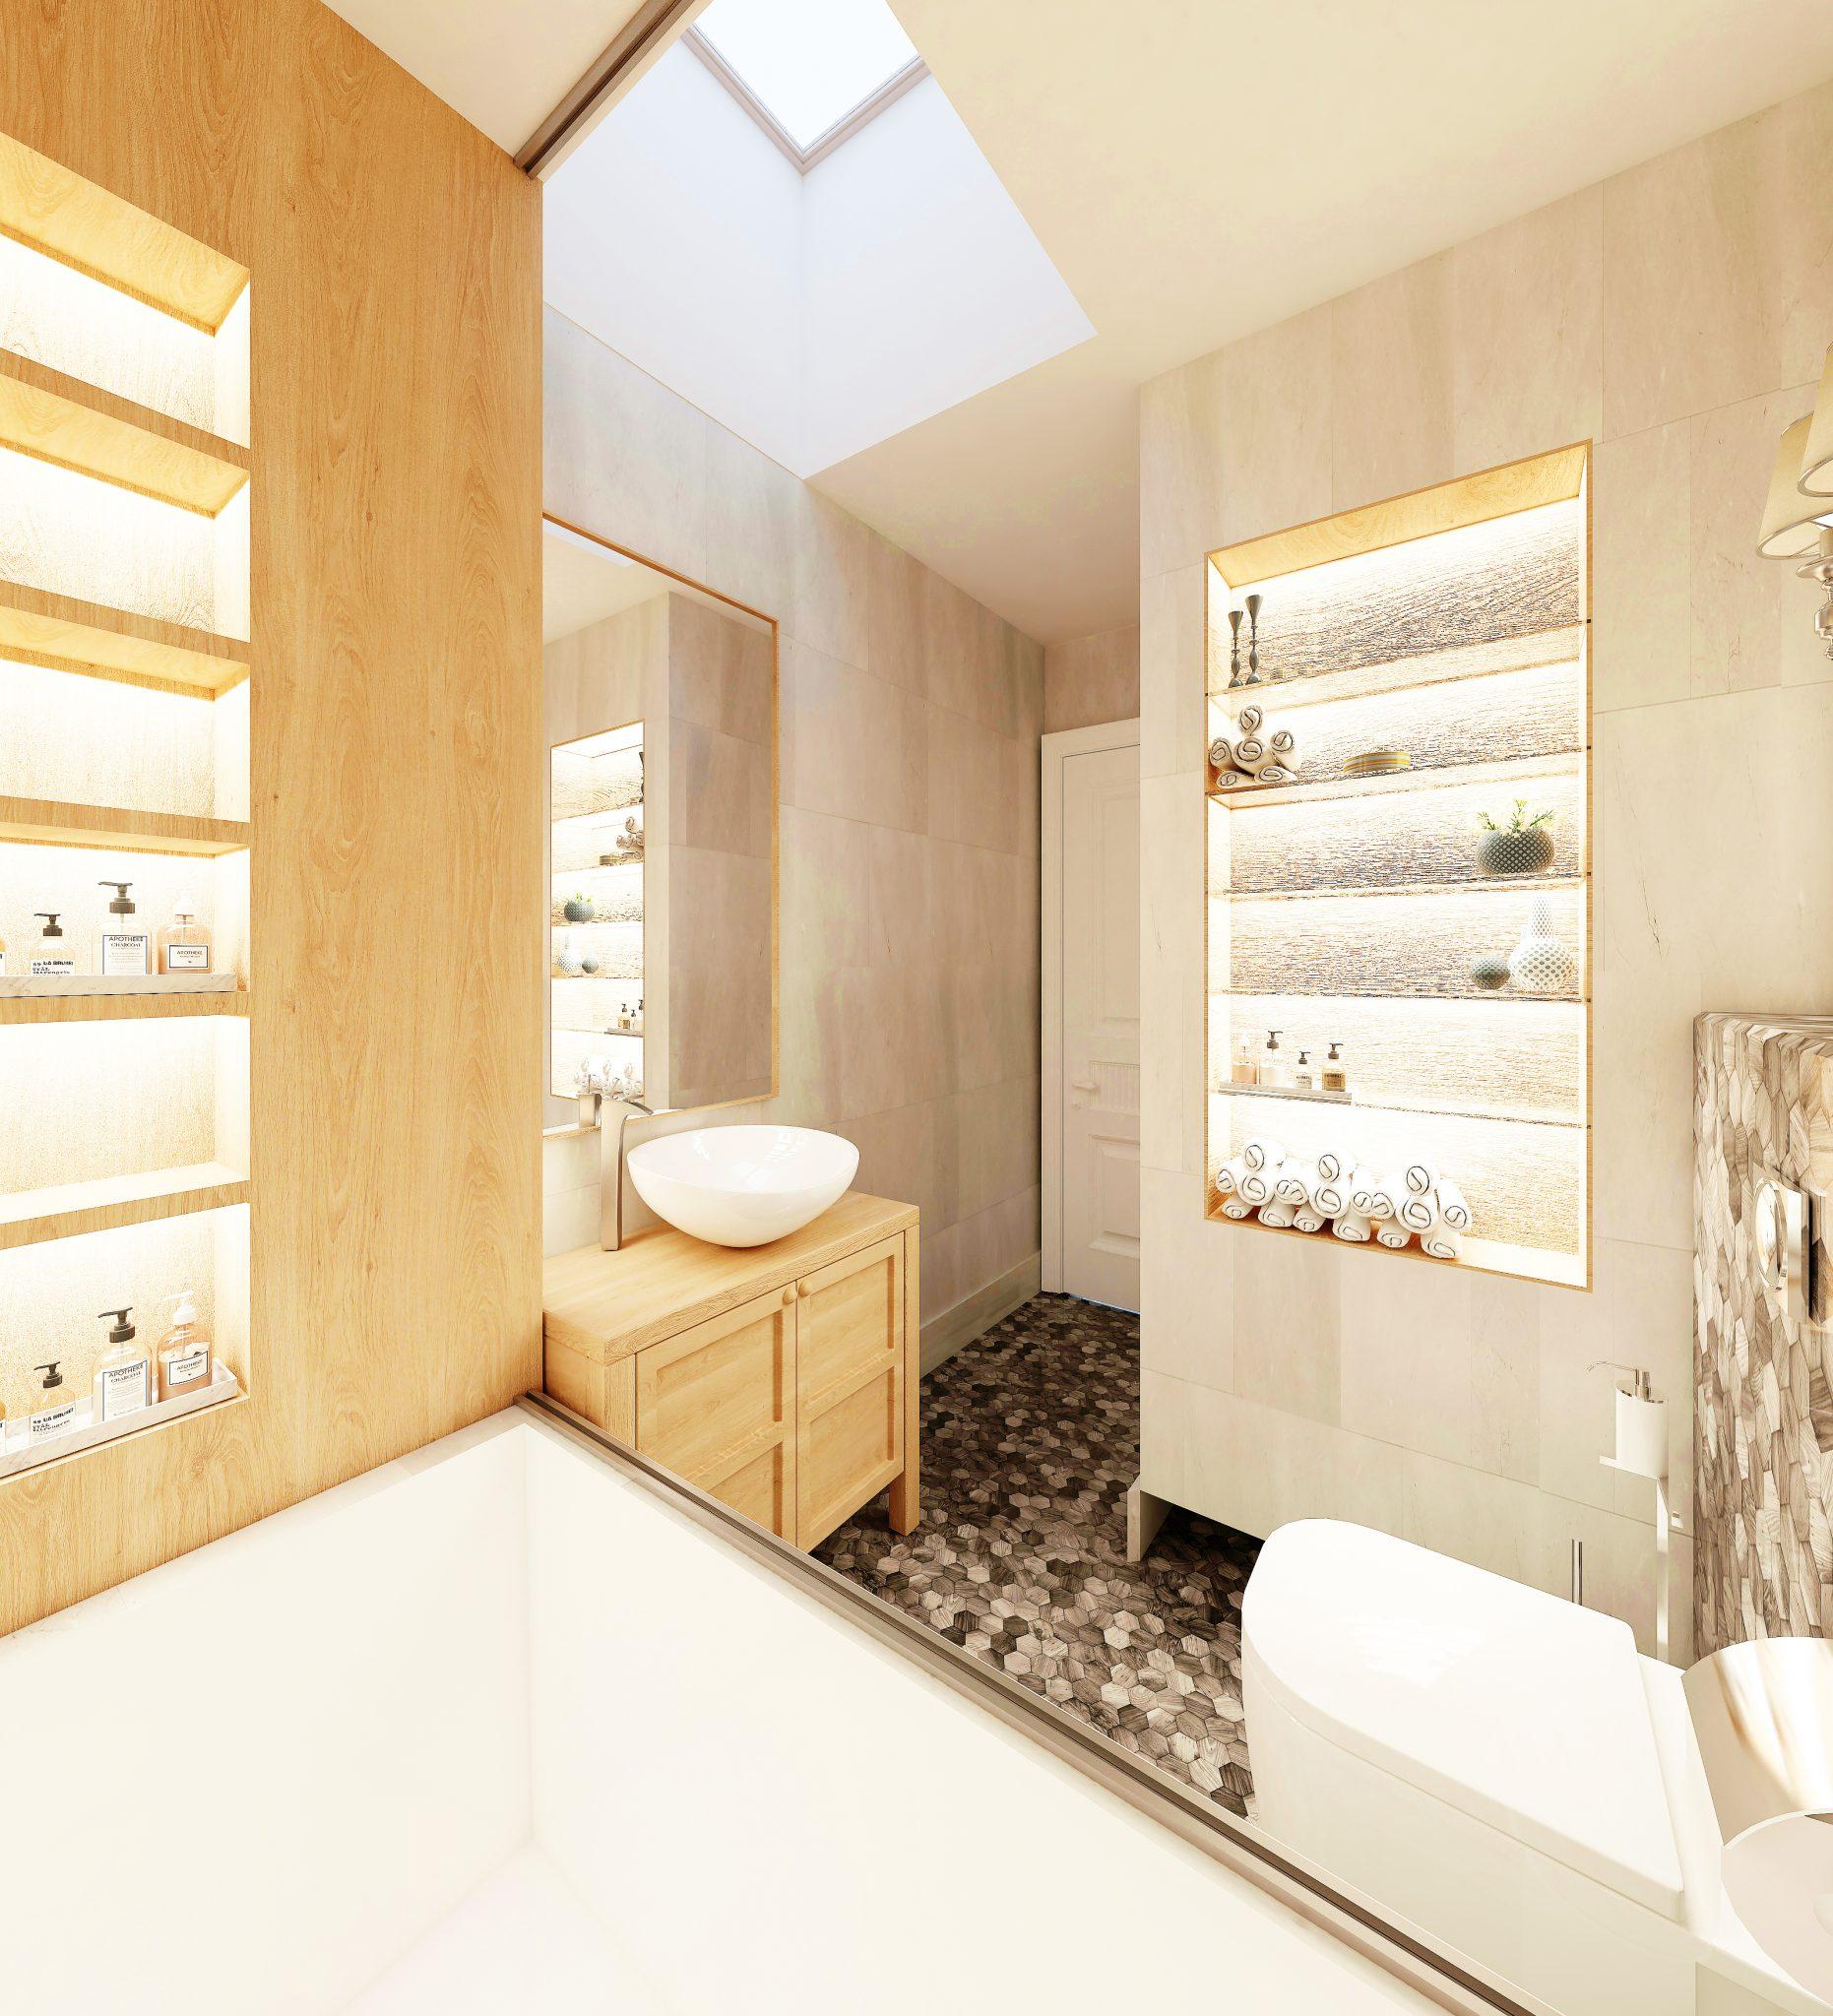 466-Bathroom Visualisation v5